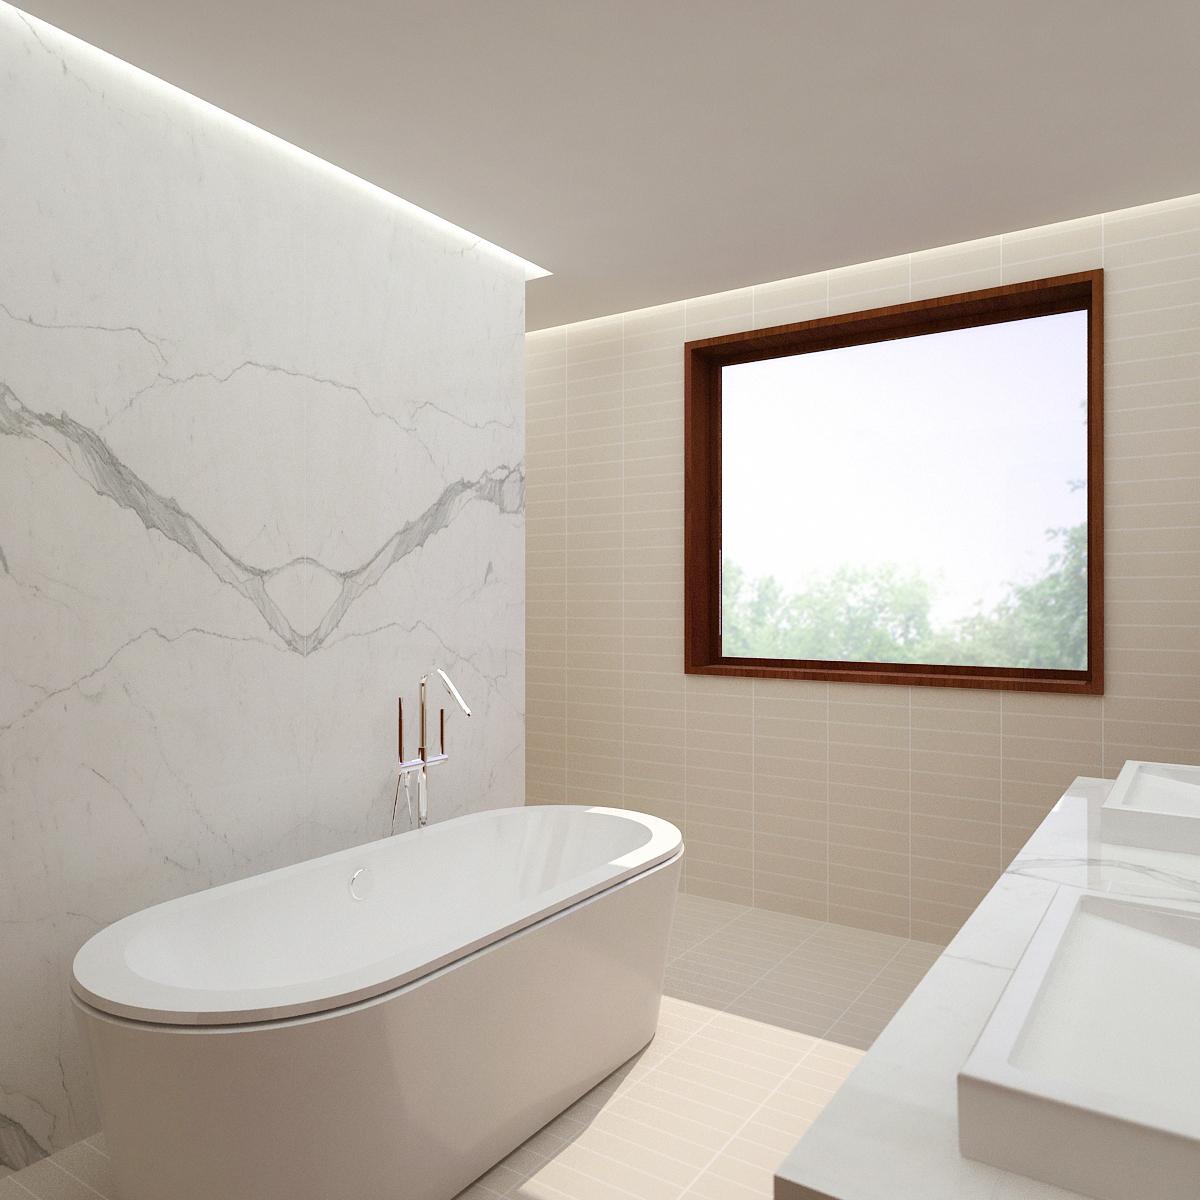 5 Piece Bathroom - Bathroom Design Ideas